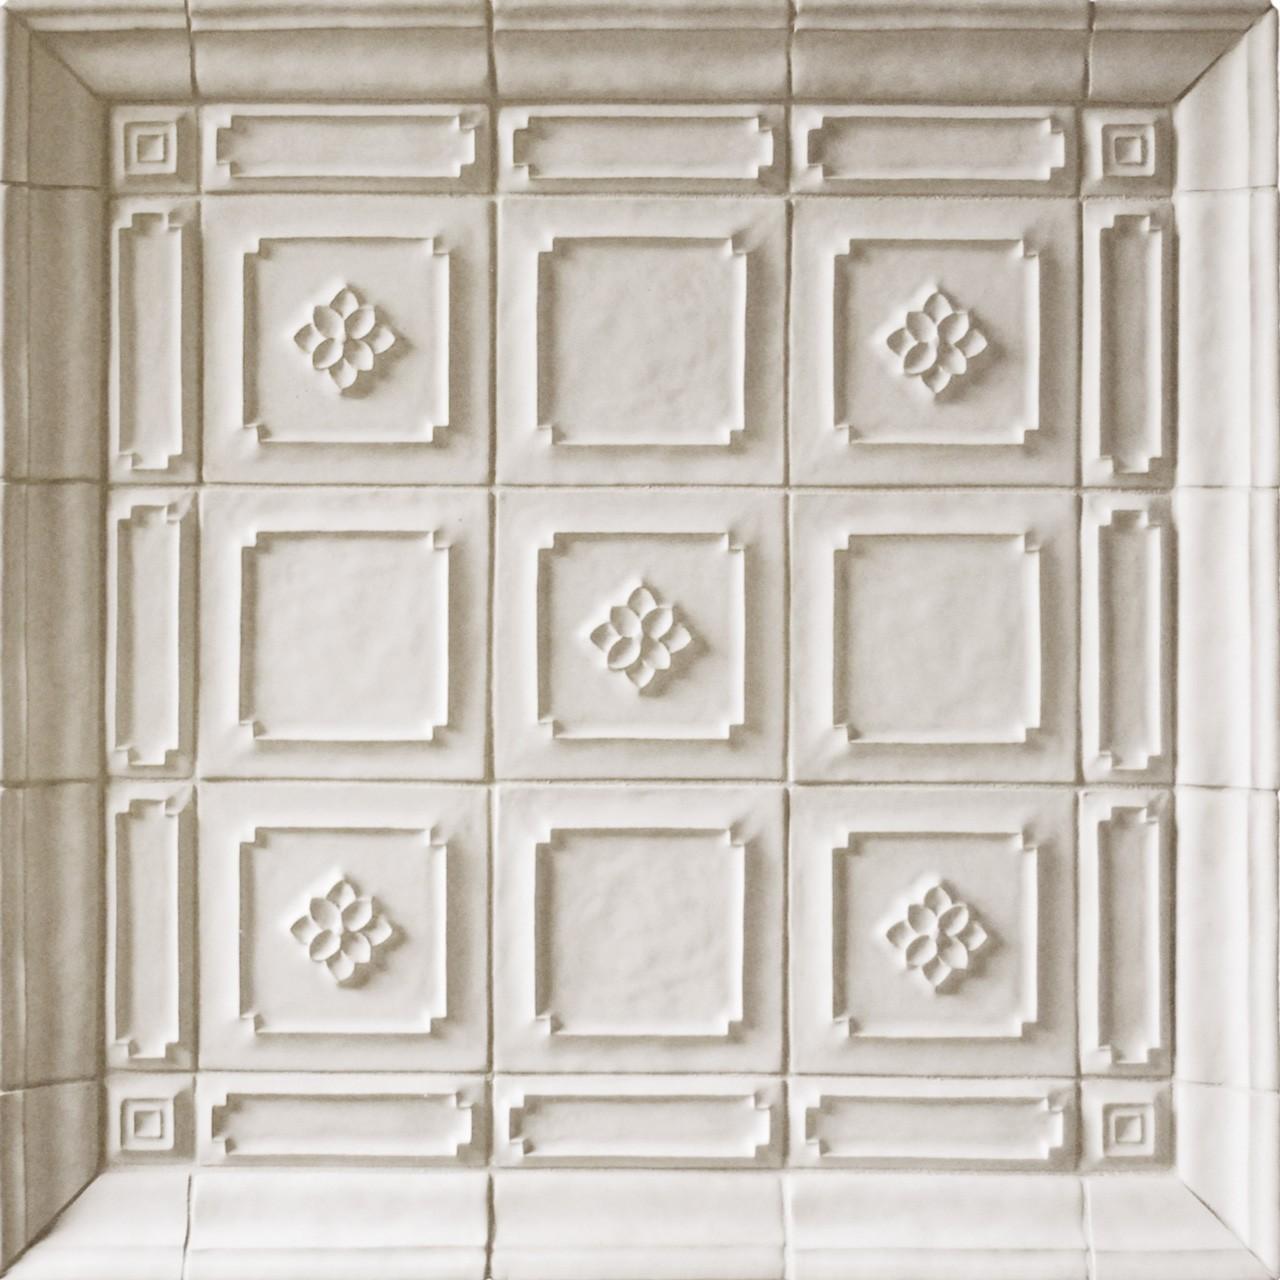 Talisman Poet's Garden, Courtyard, Border, 2-inch, Crown Molding white ceramic tile display